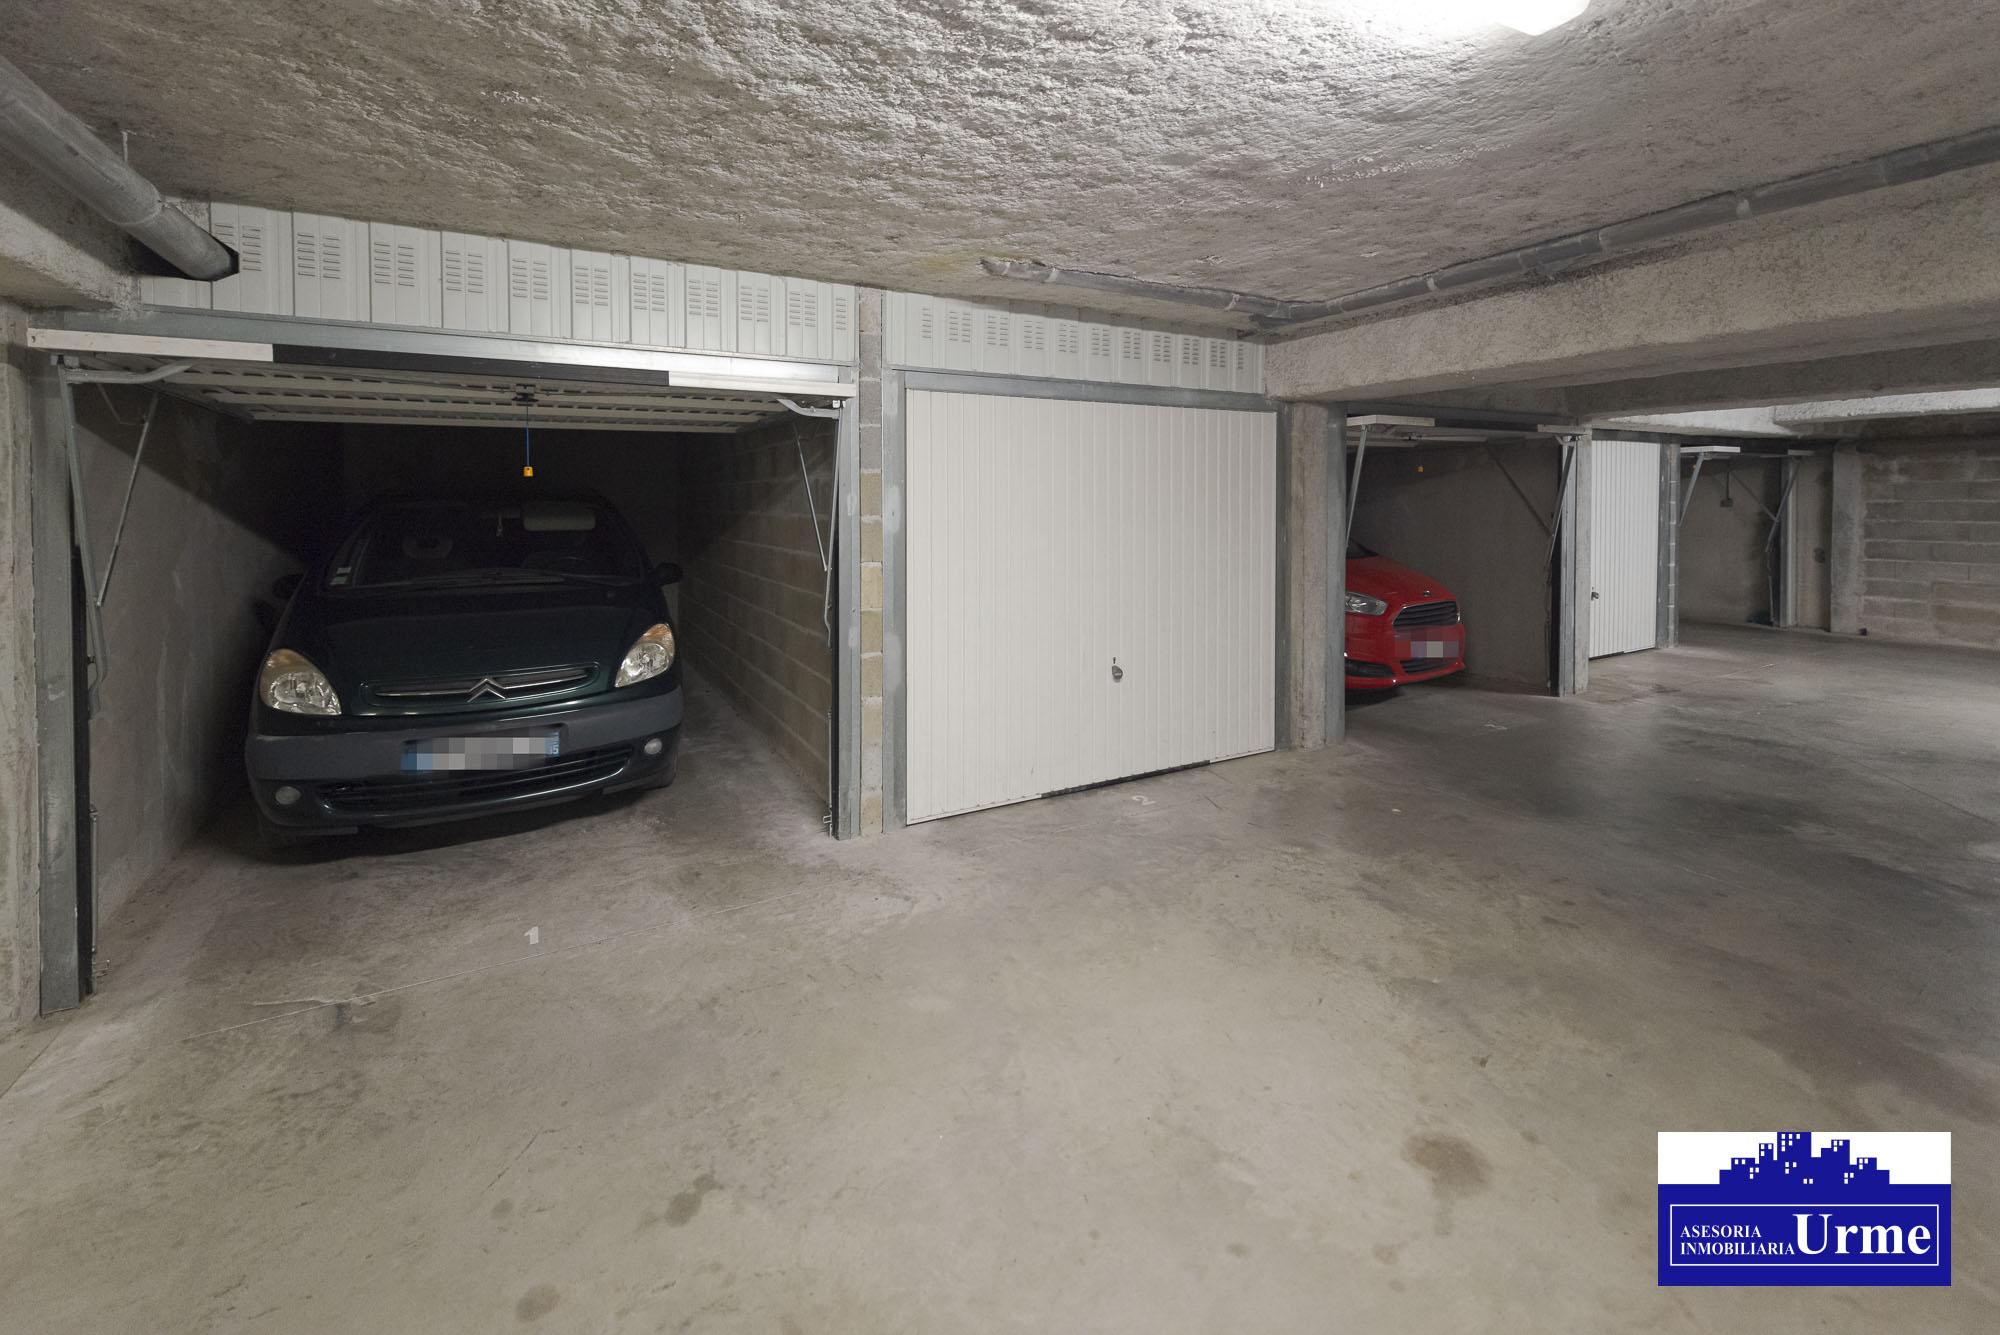 En Hendaia, centrico, ideal inversion o disfrute!! apartamento con garaje cerrado!!Para entrar. Impecable! Ven a conocerlo